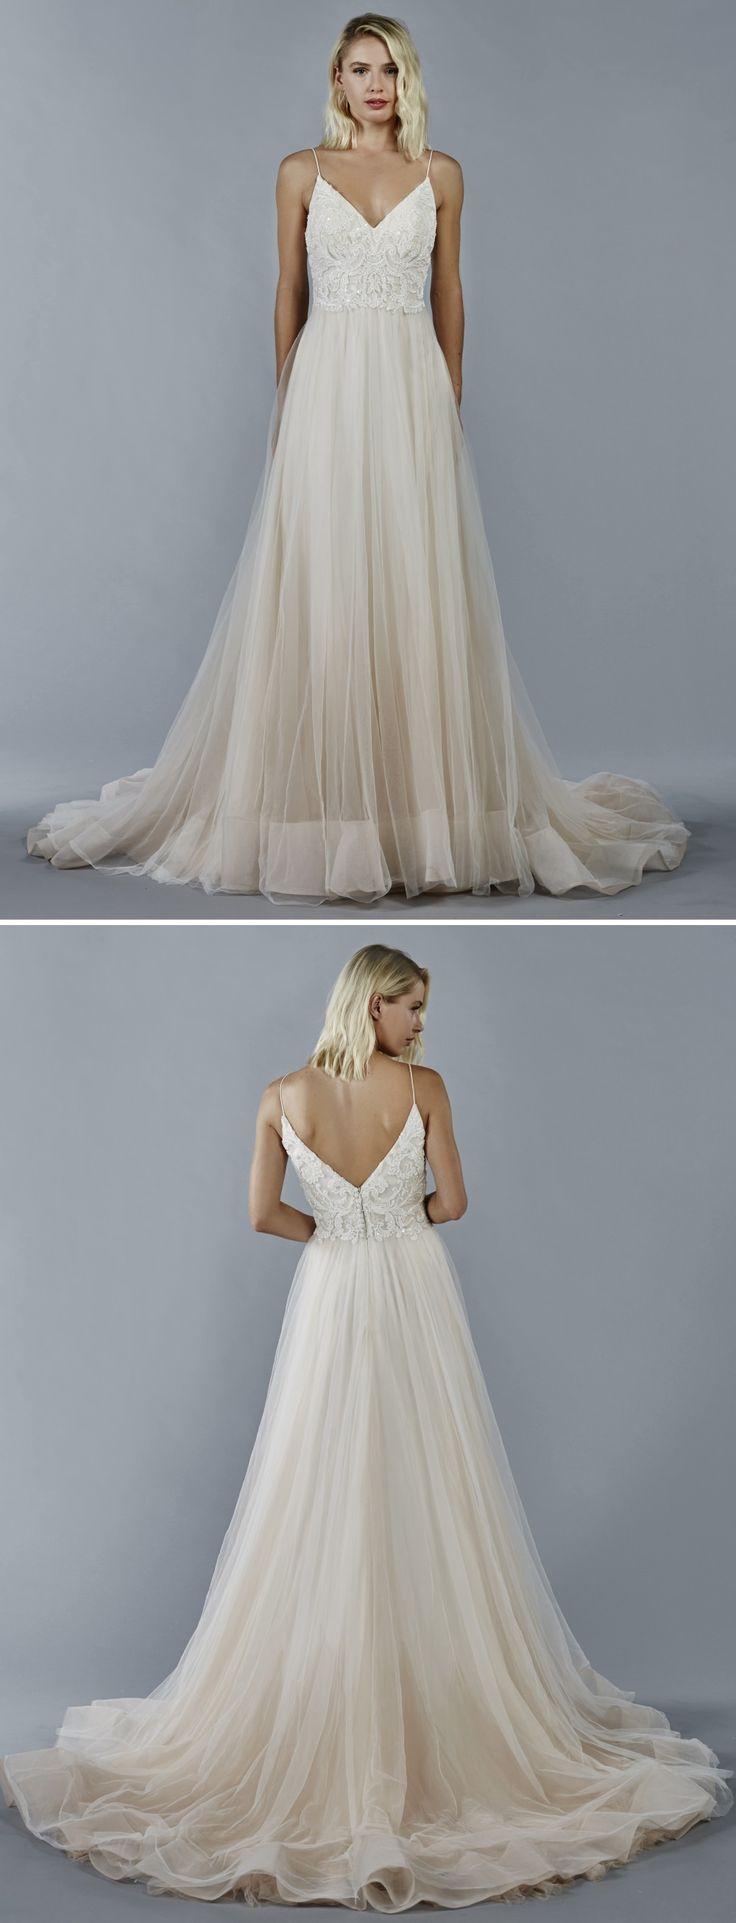 355 best Blush Weddings images on Pinterest | Wedding ideas, Bride ...